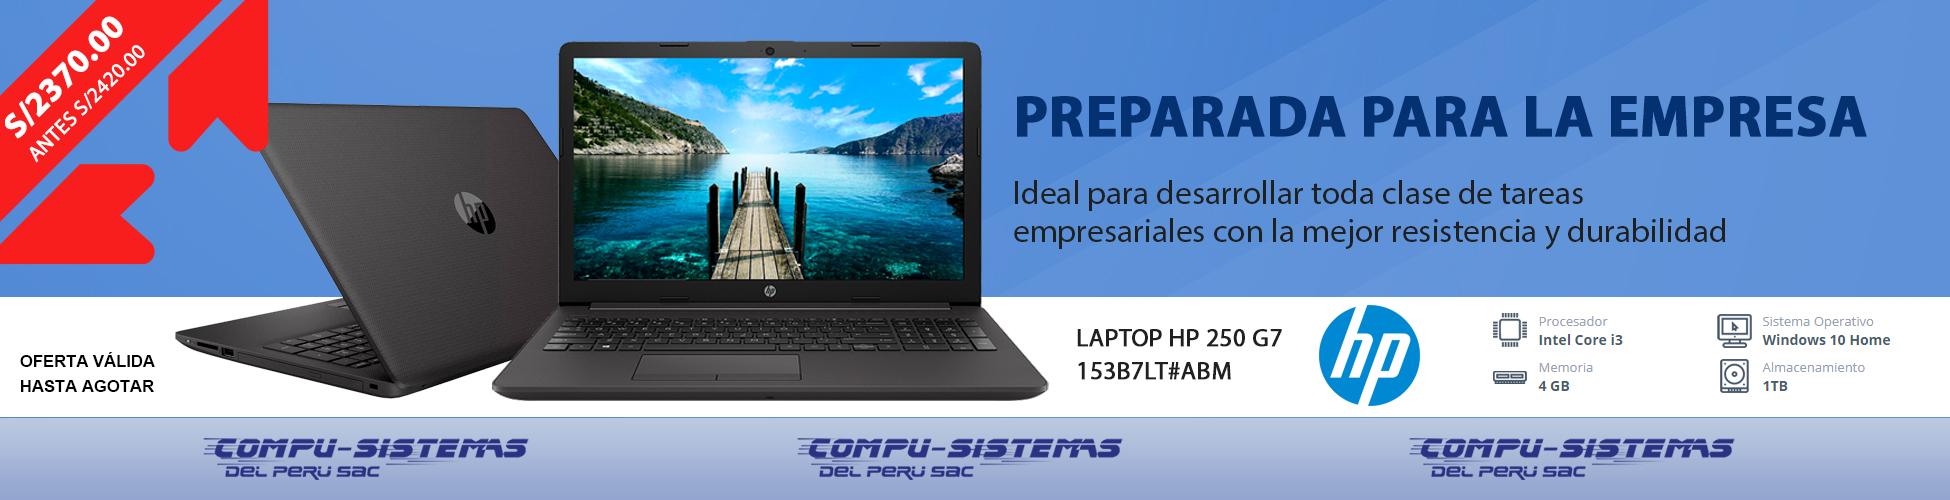 propuesta banner laptop HP 250 GT